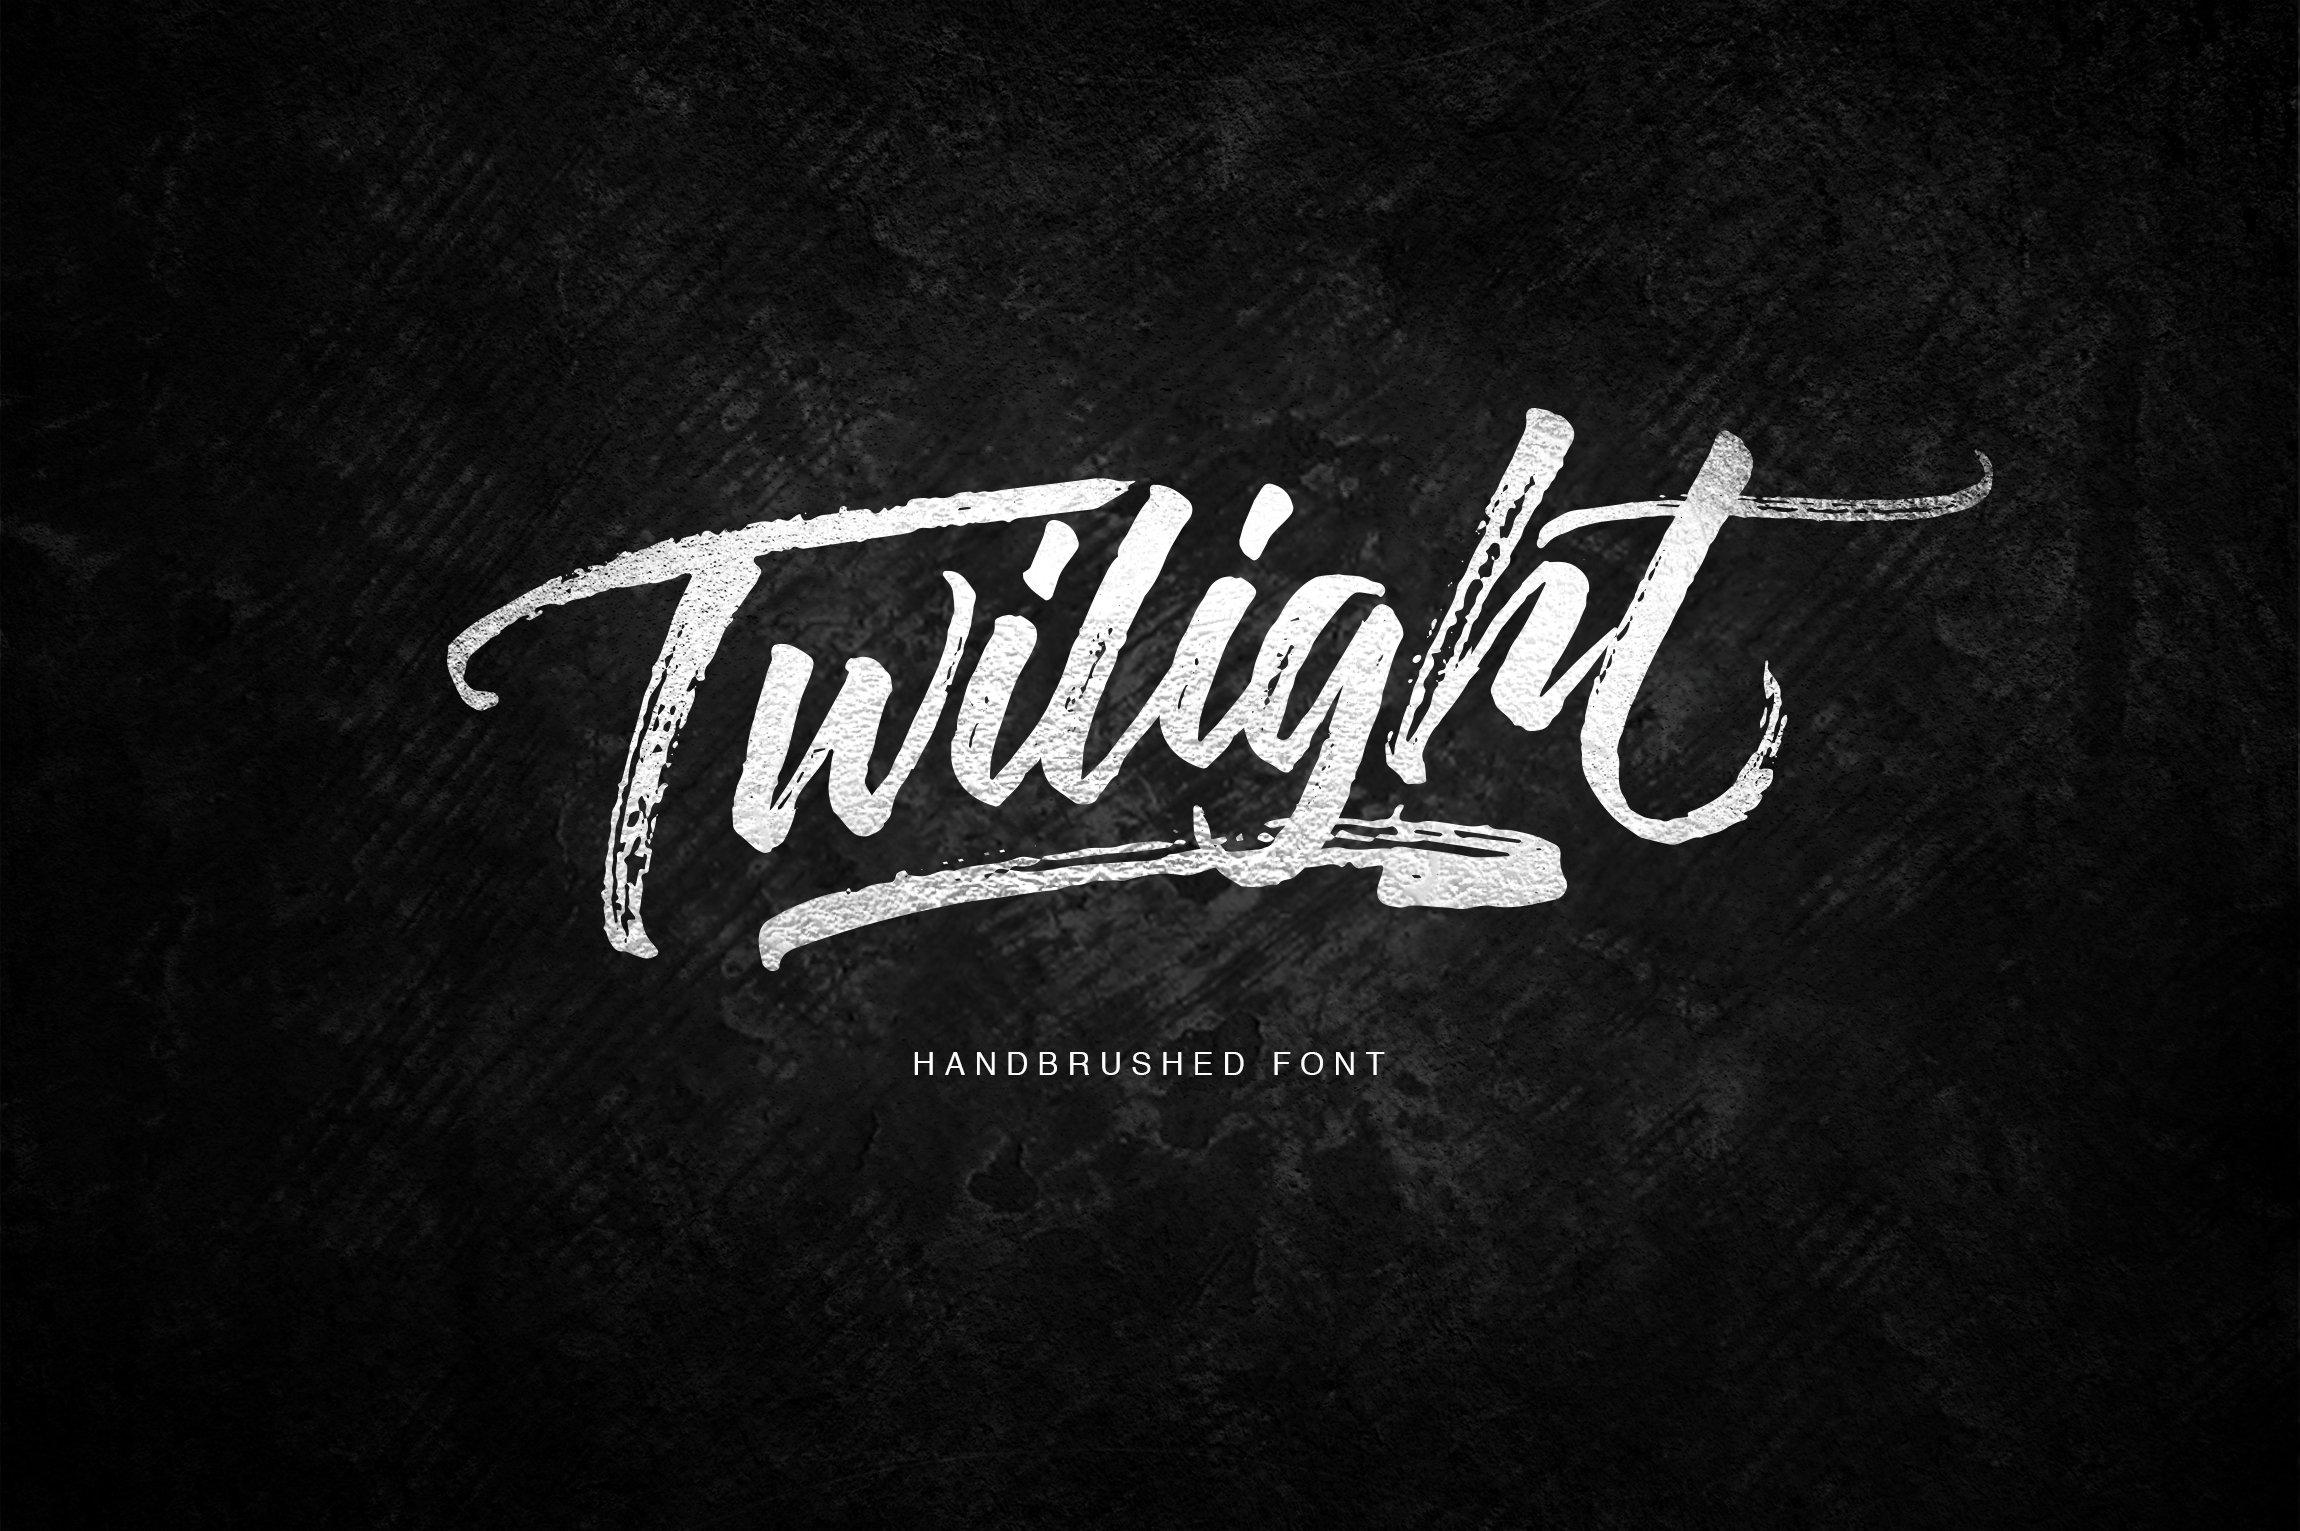 Best Handwritting Fonts For Web Design